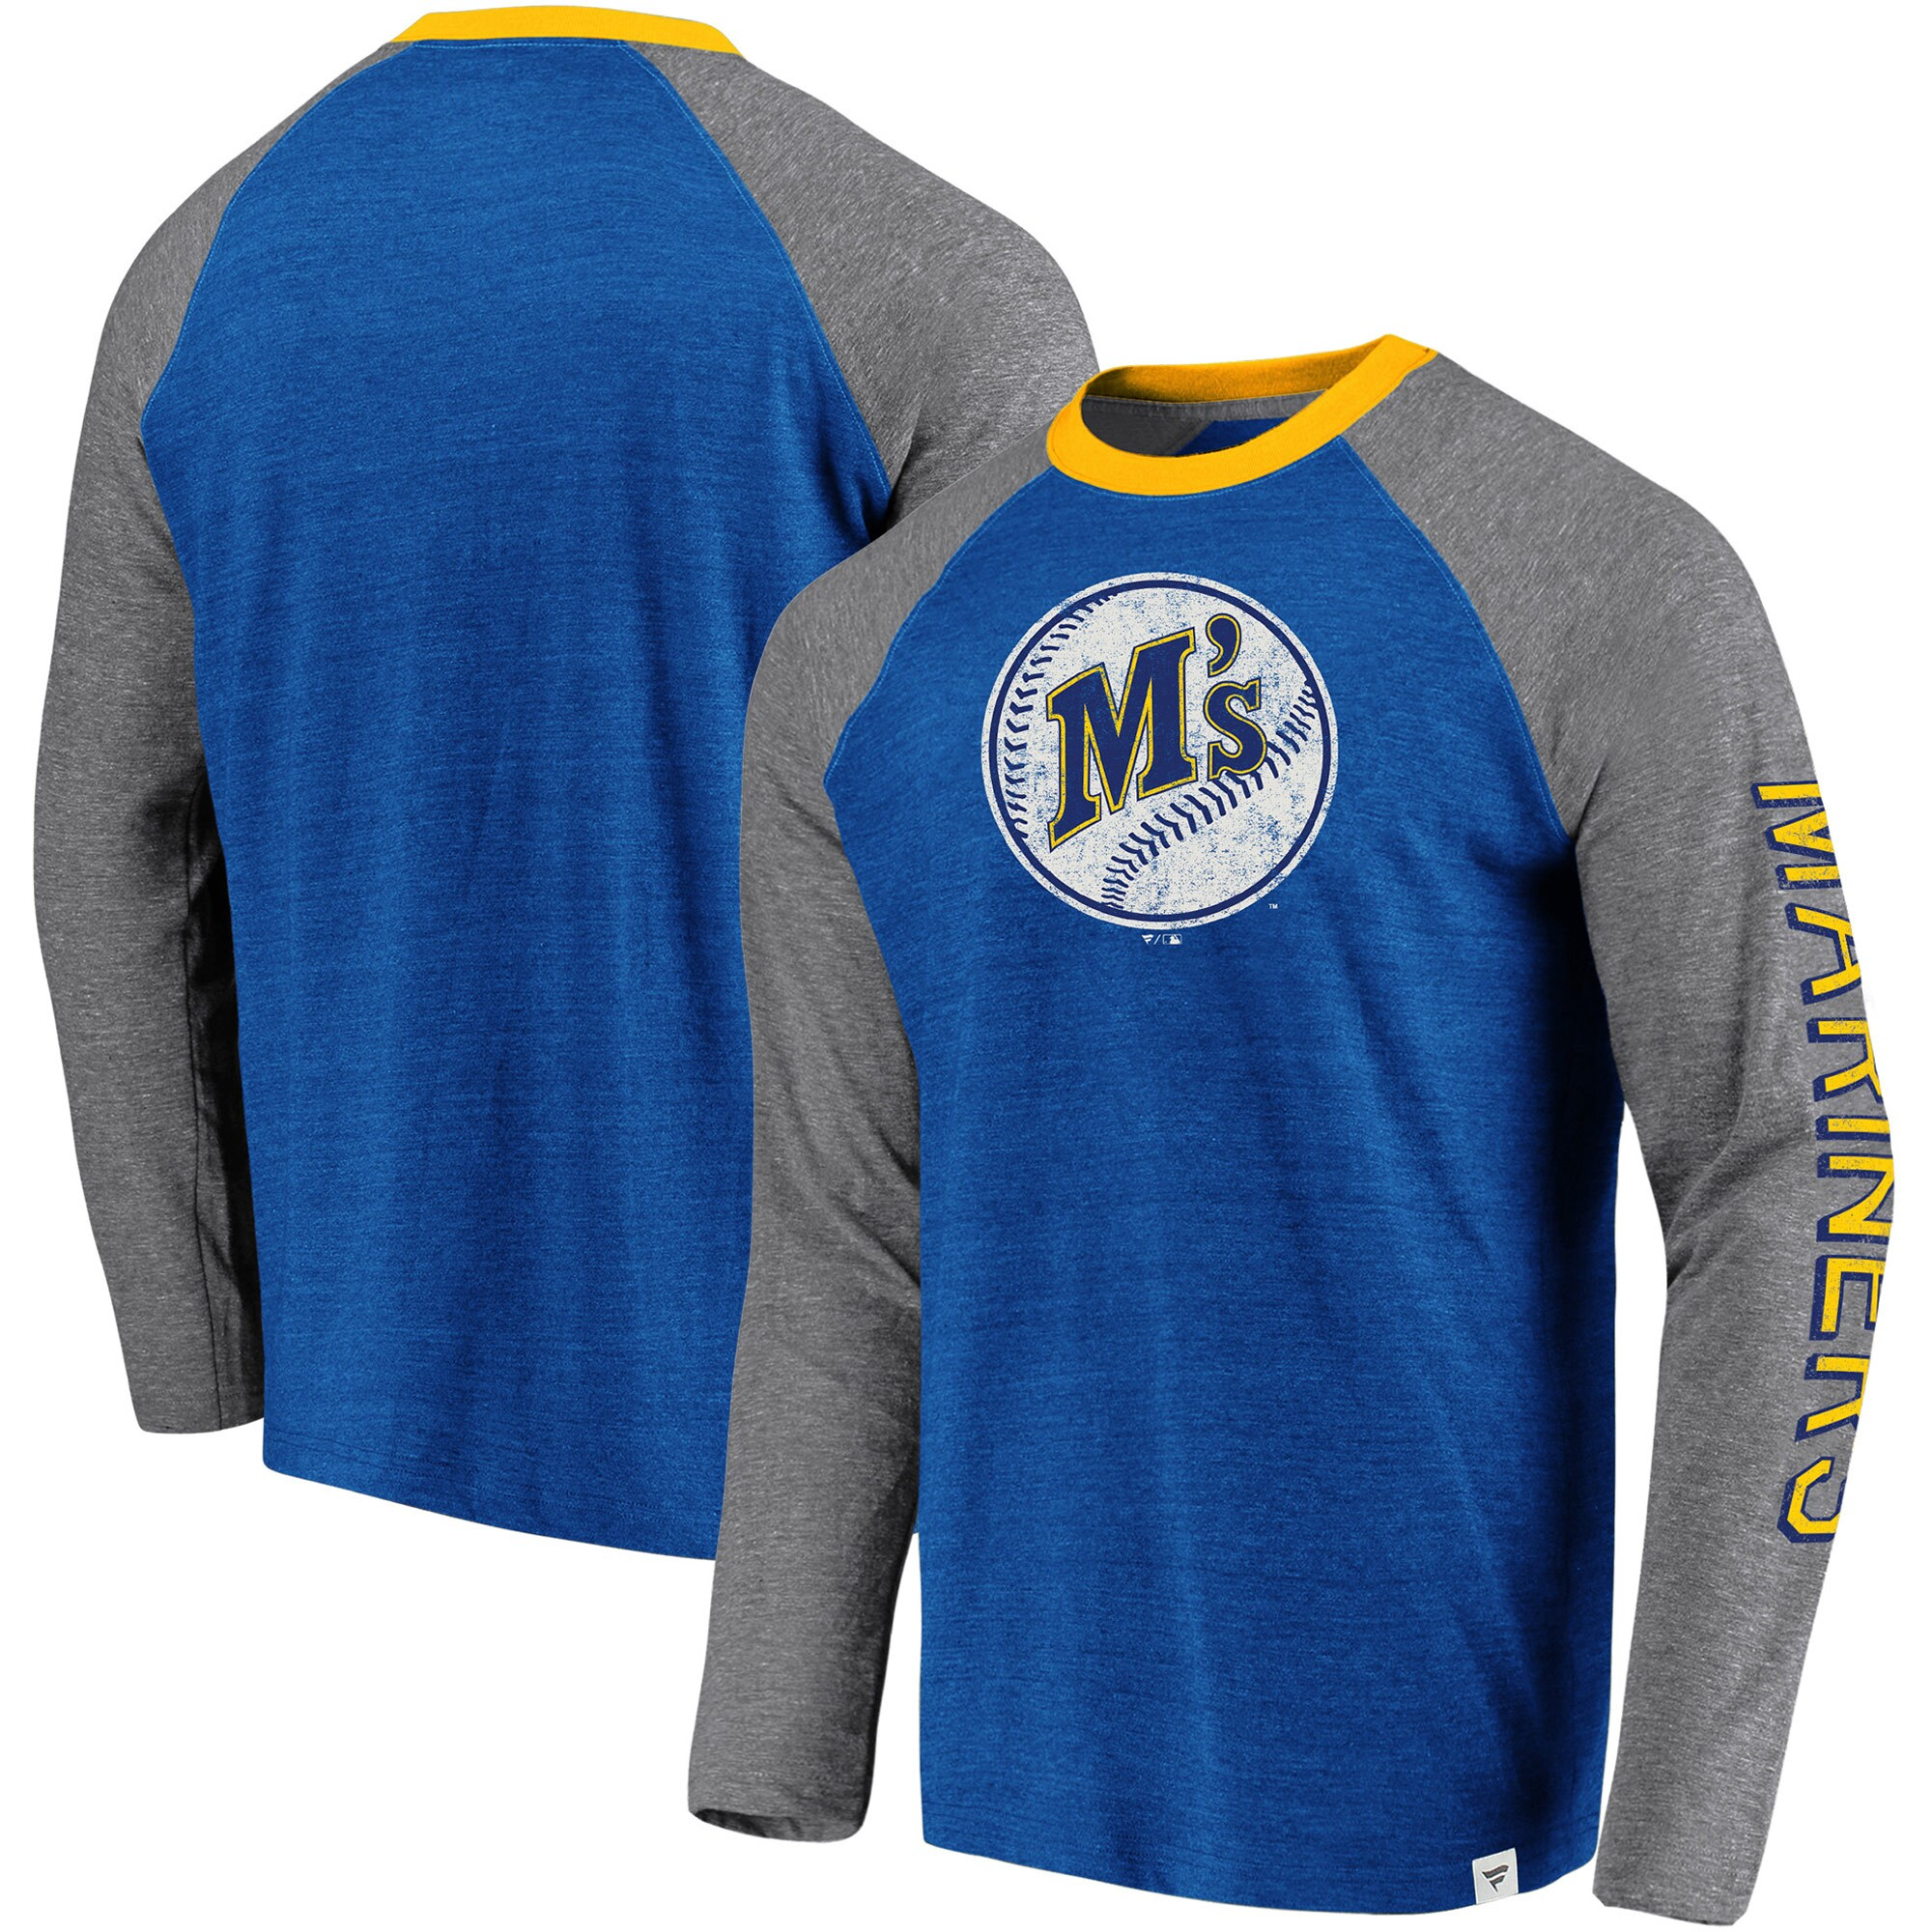 Seattle Mariners Fanatics Branded True Classics Long Sleeve Raglan T-Shirt - Royal/Gray